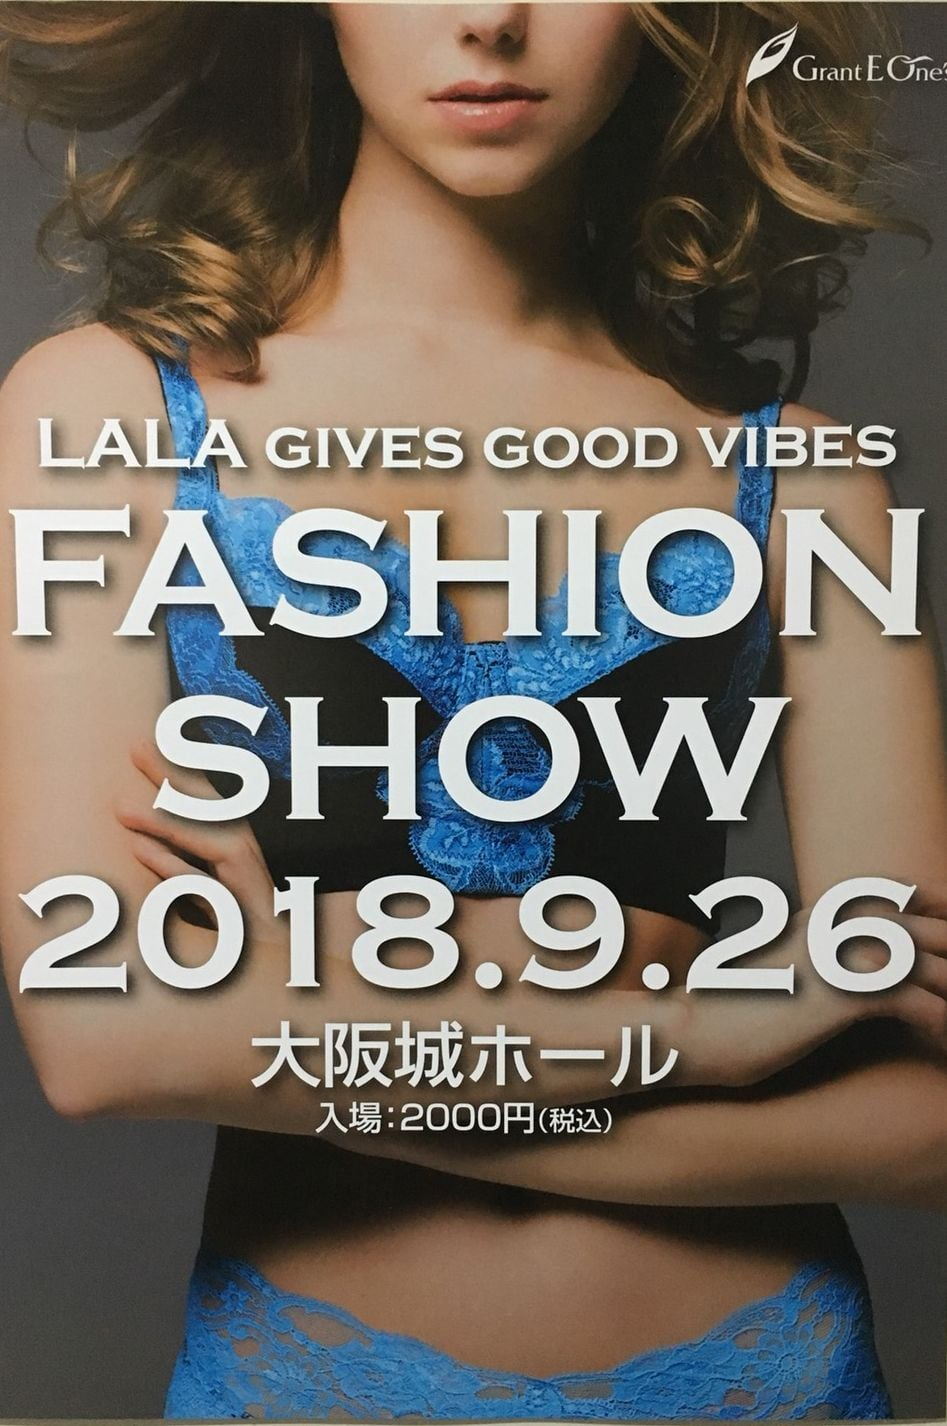 LALA GIVES GOODS VIBES FASHION SHOWのイメージその1